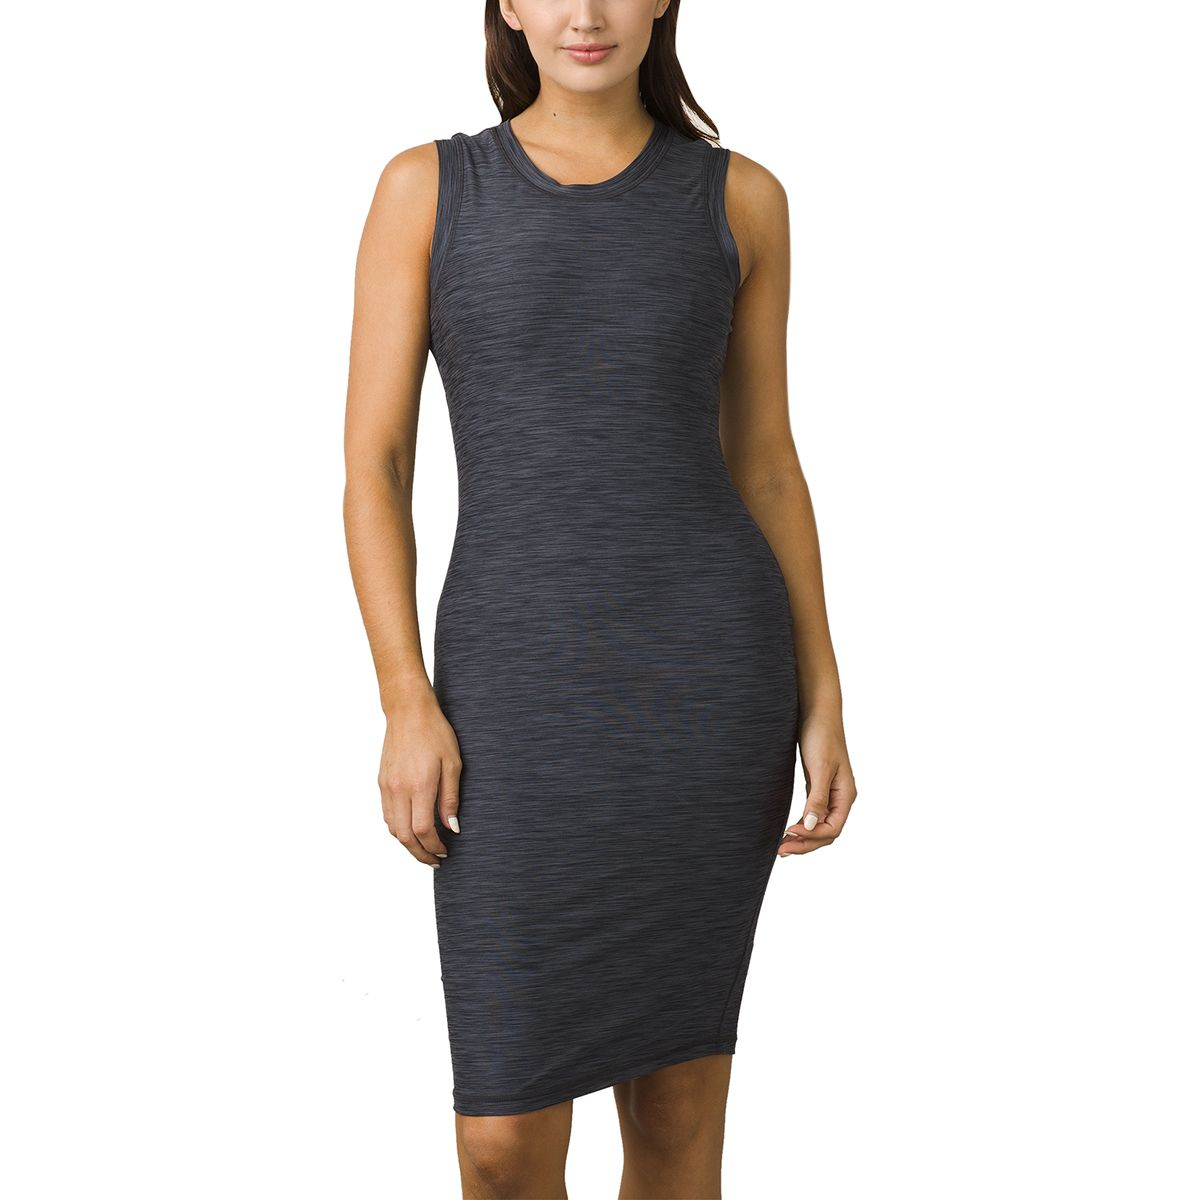 Prana Vertex Dress - Women's Charcoal, S PRA015M-CH-S